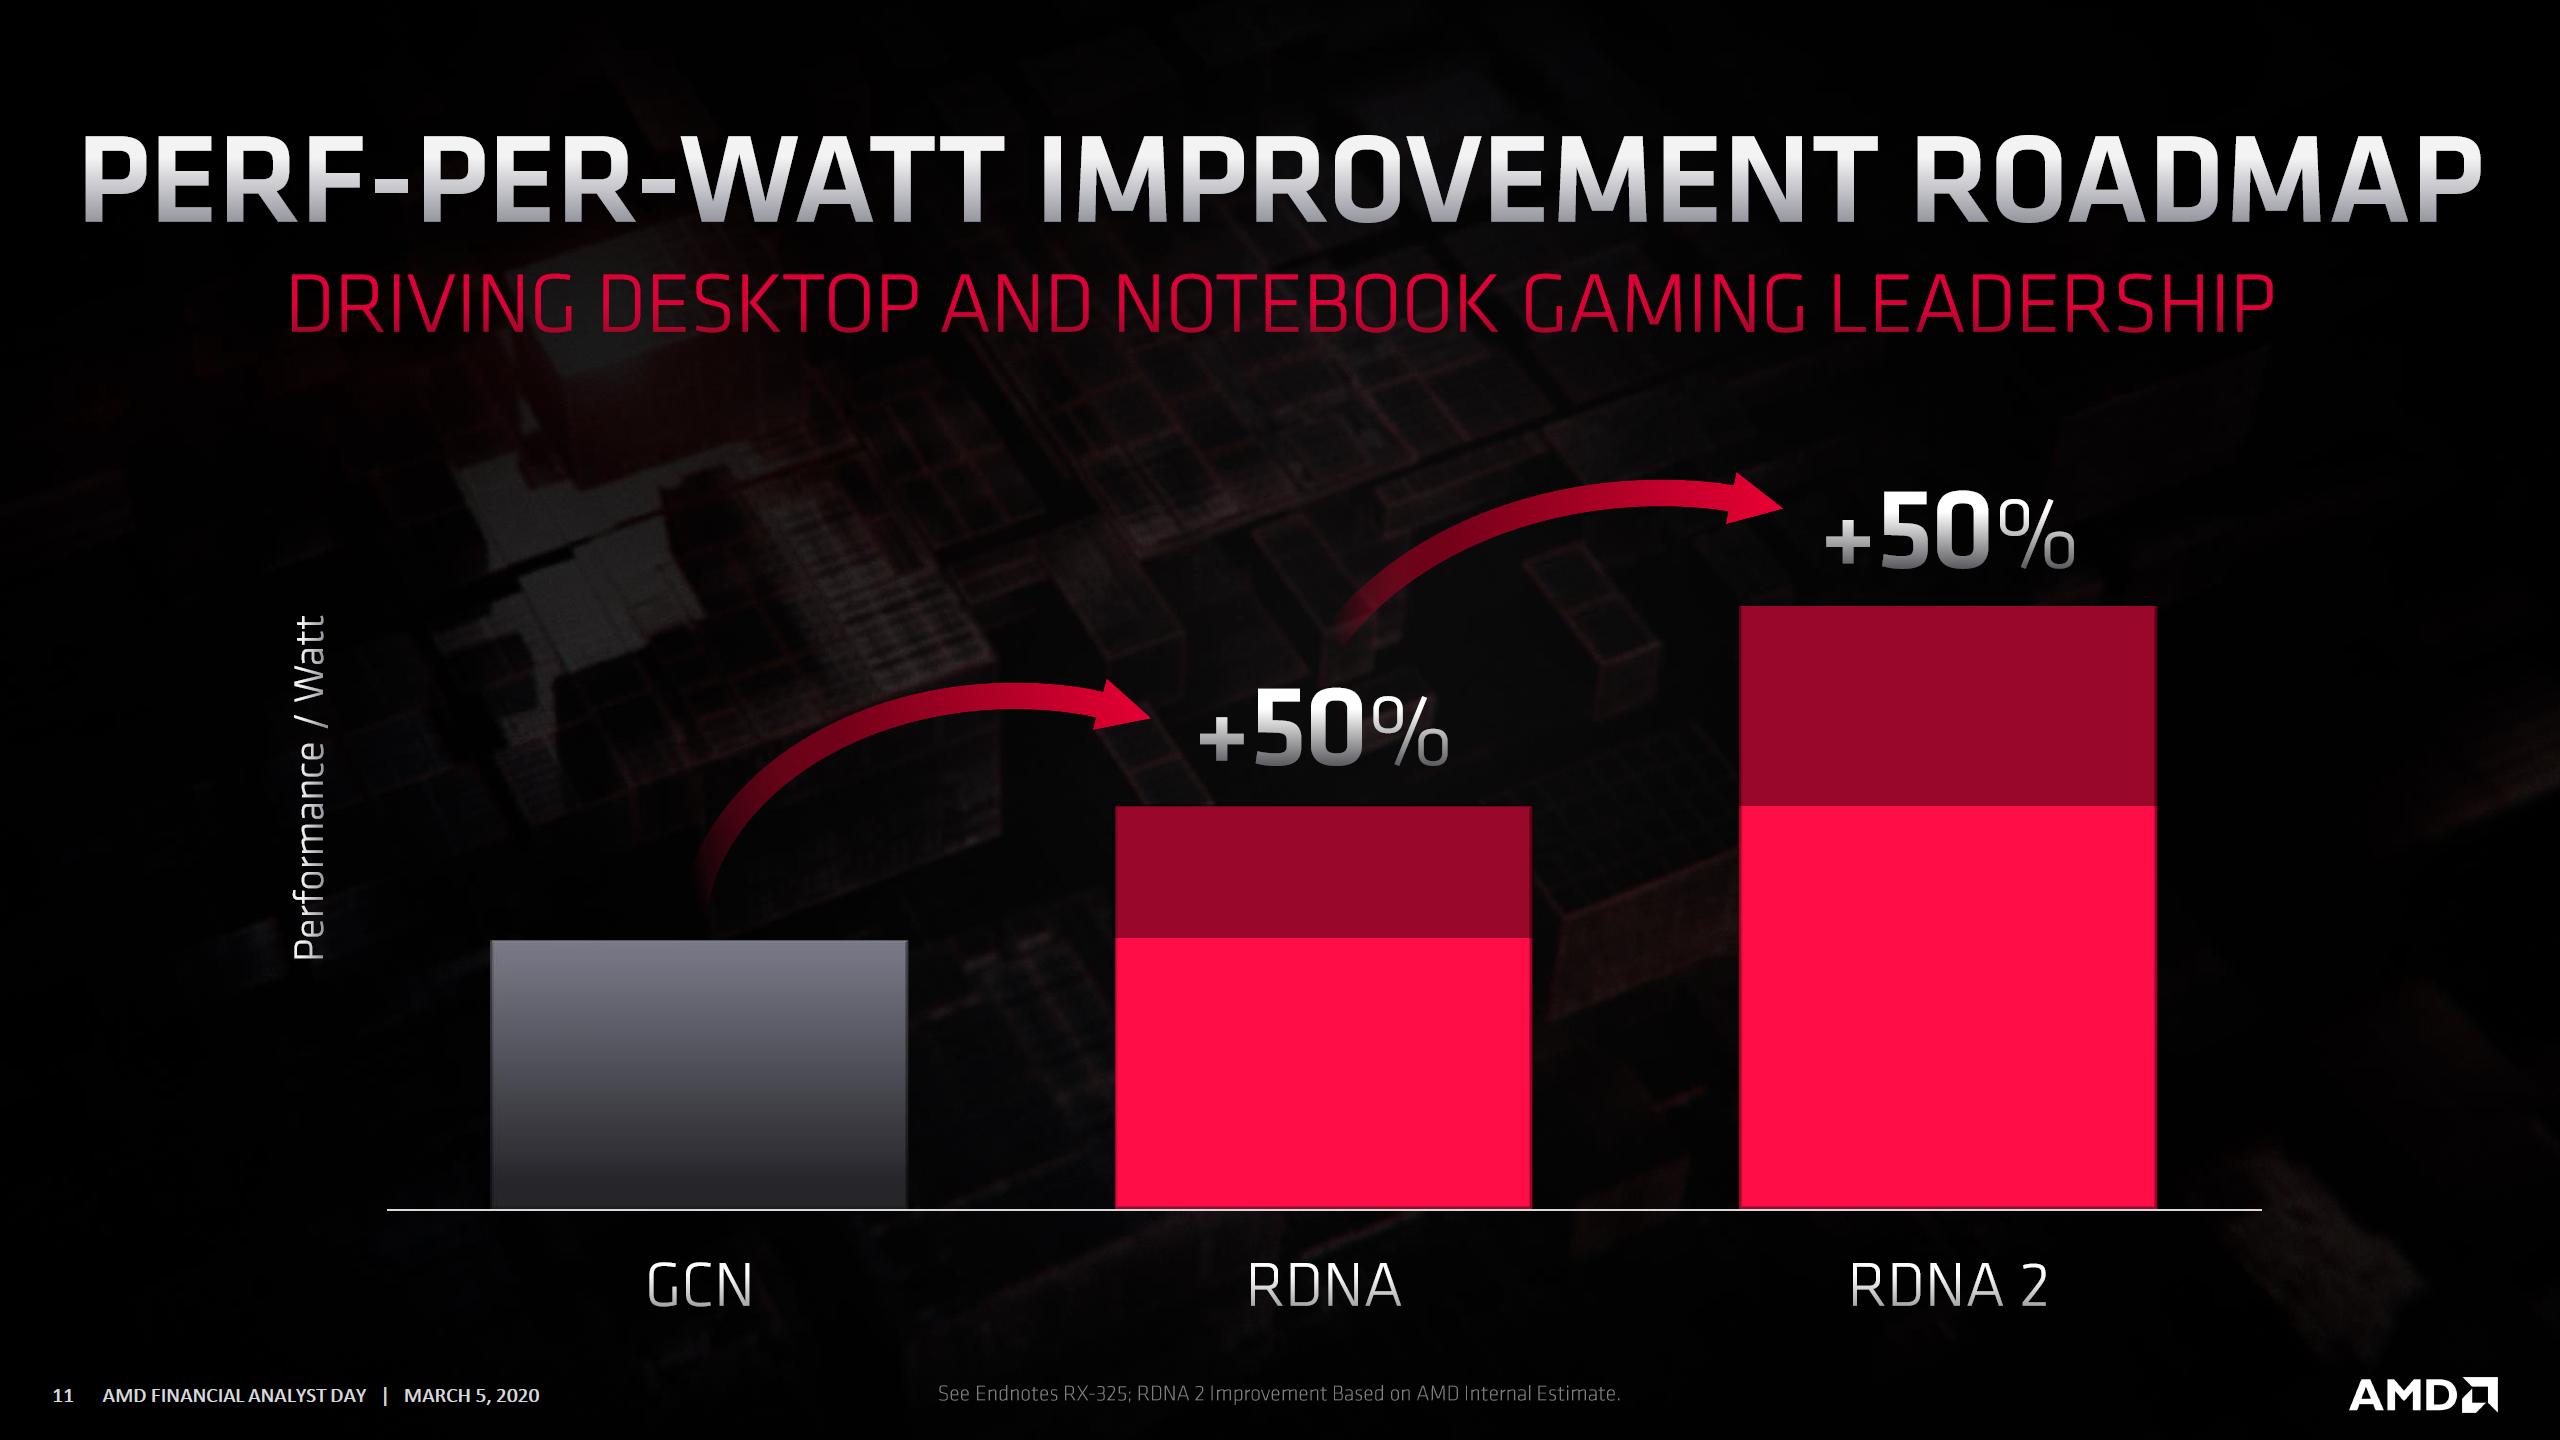 Amd Rdna2 Radeon Rx Navi 2x Gpus With 2x Performance Efficency Arriving This Year